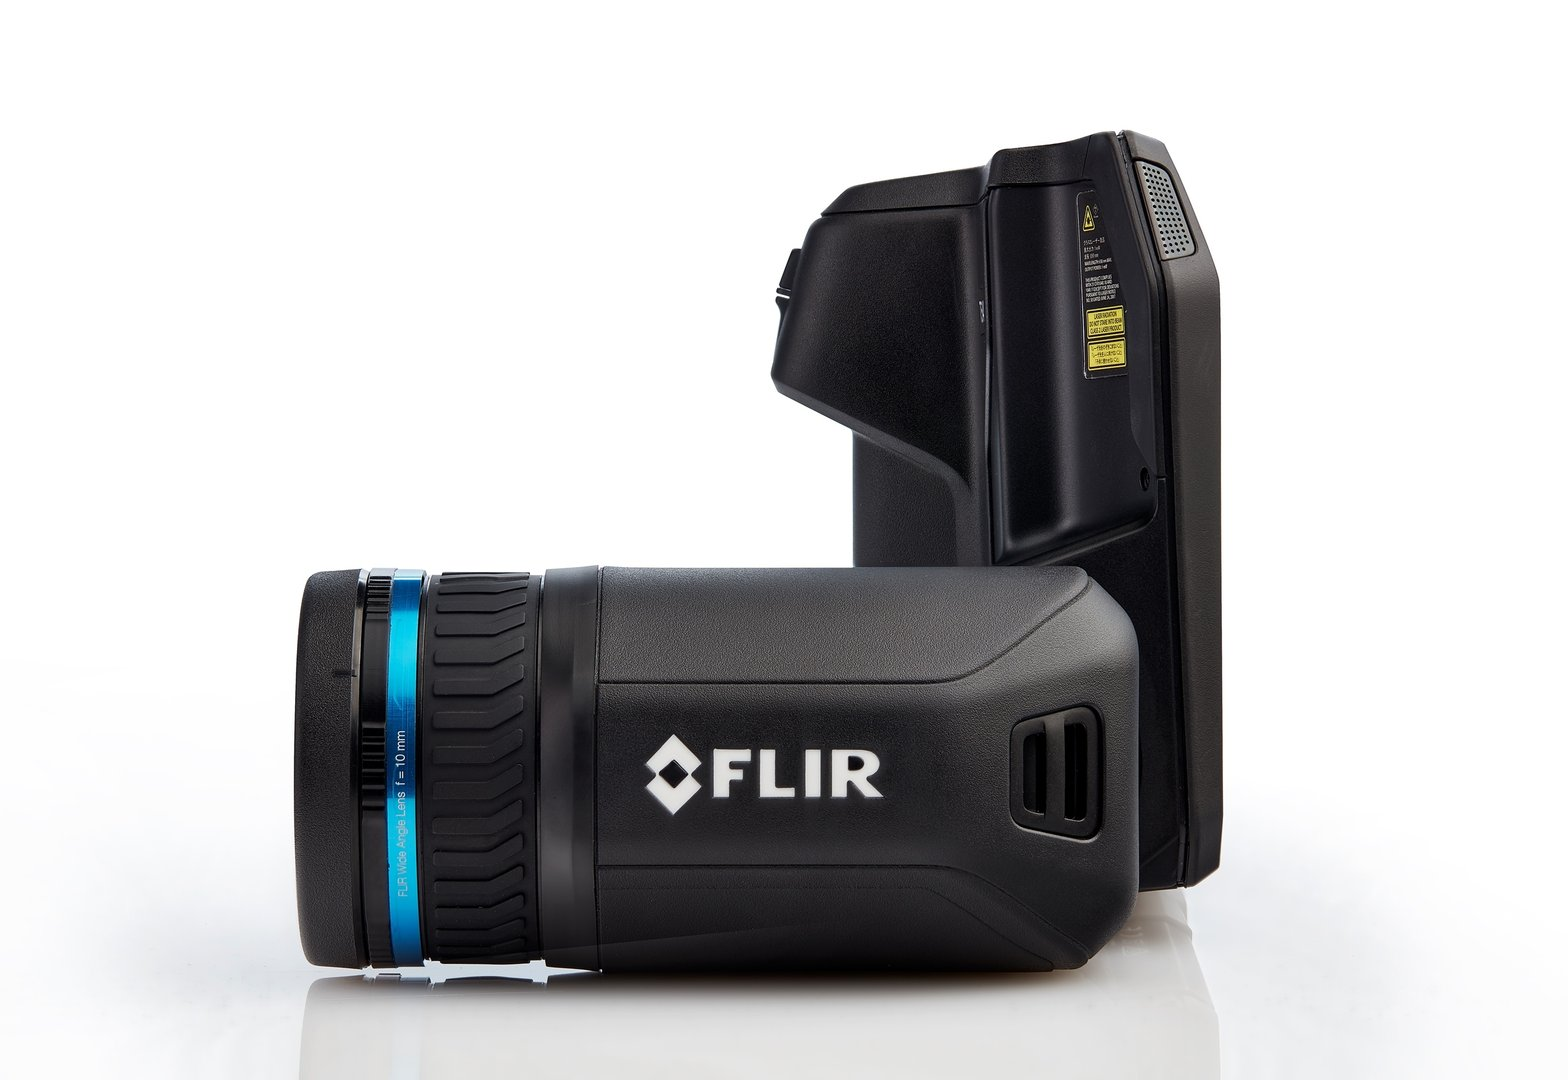 Wärmebildkamera Jagd Mit Entfernungsmesser : Wärmebildkamera jagd mit entfernungsmesser die beste